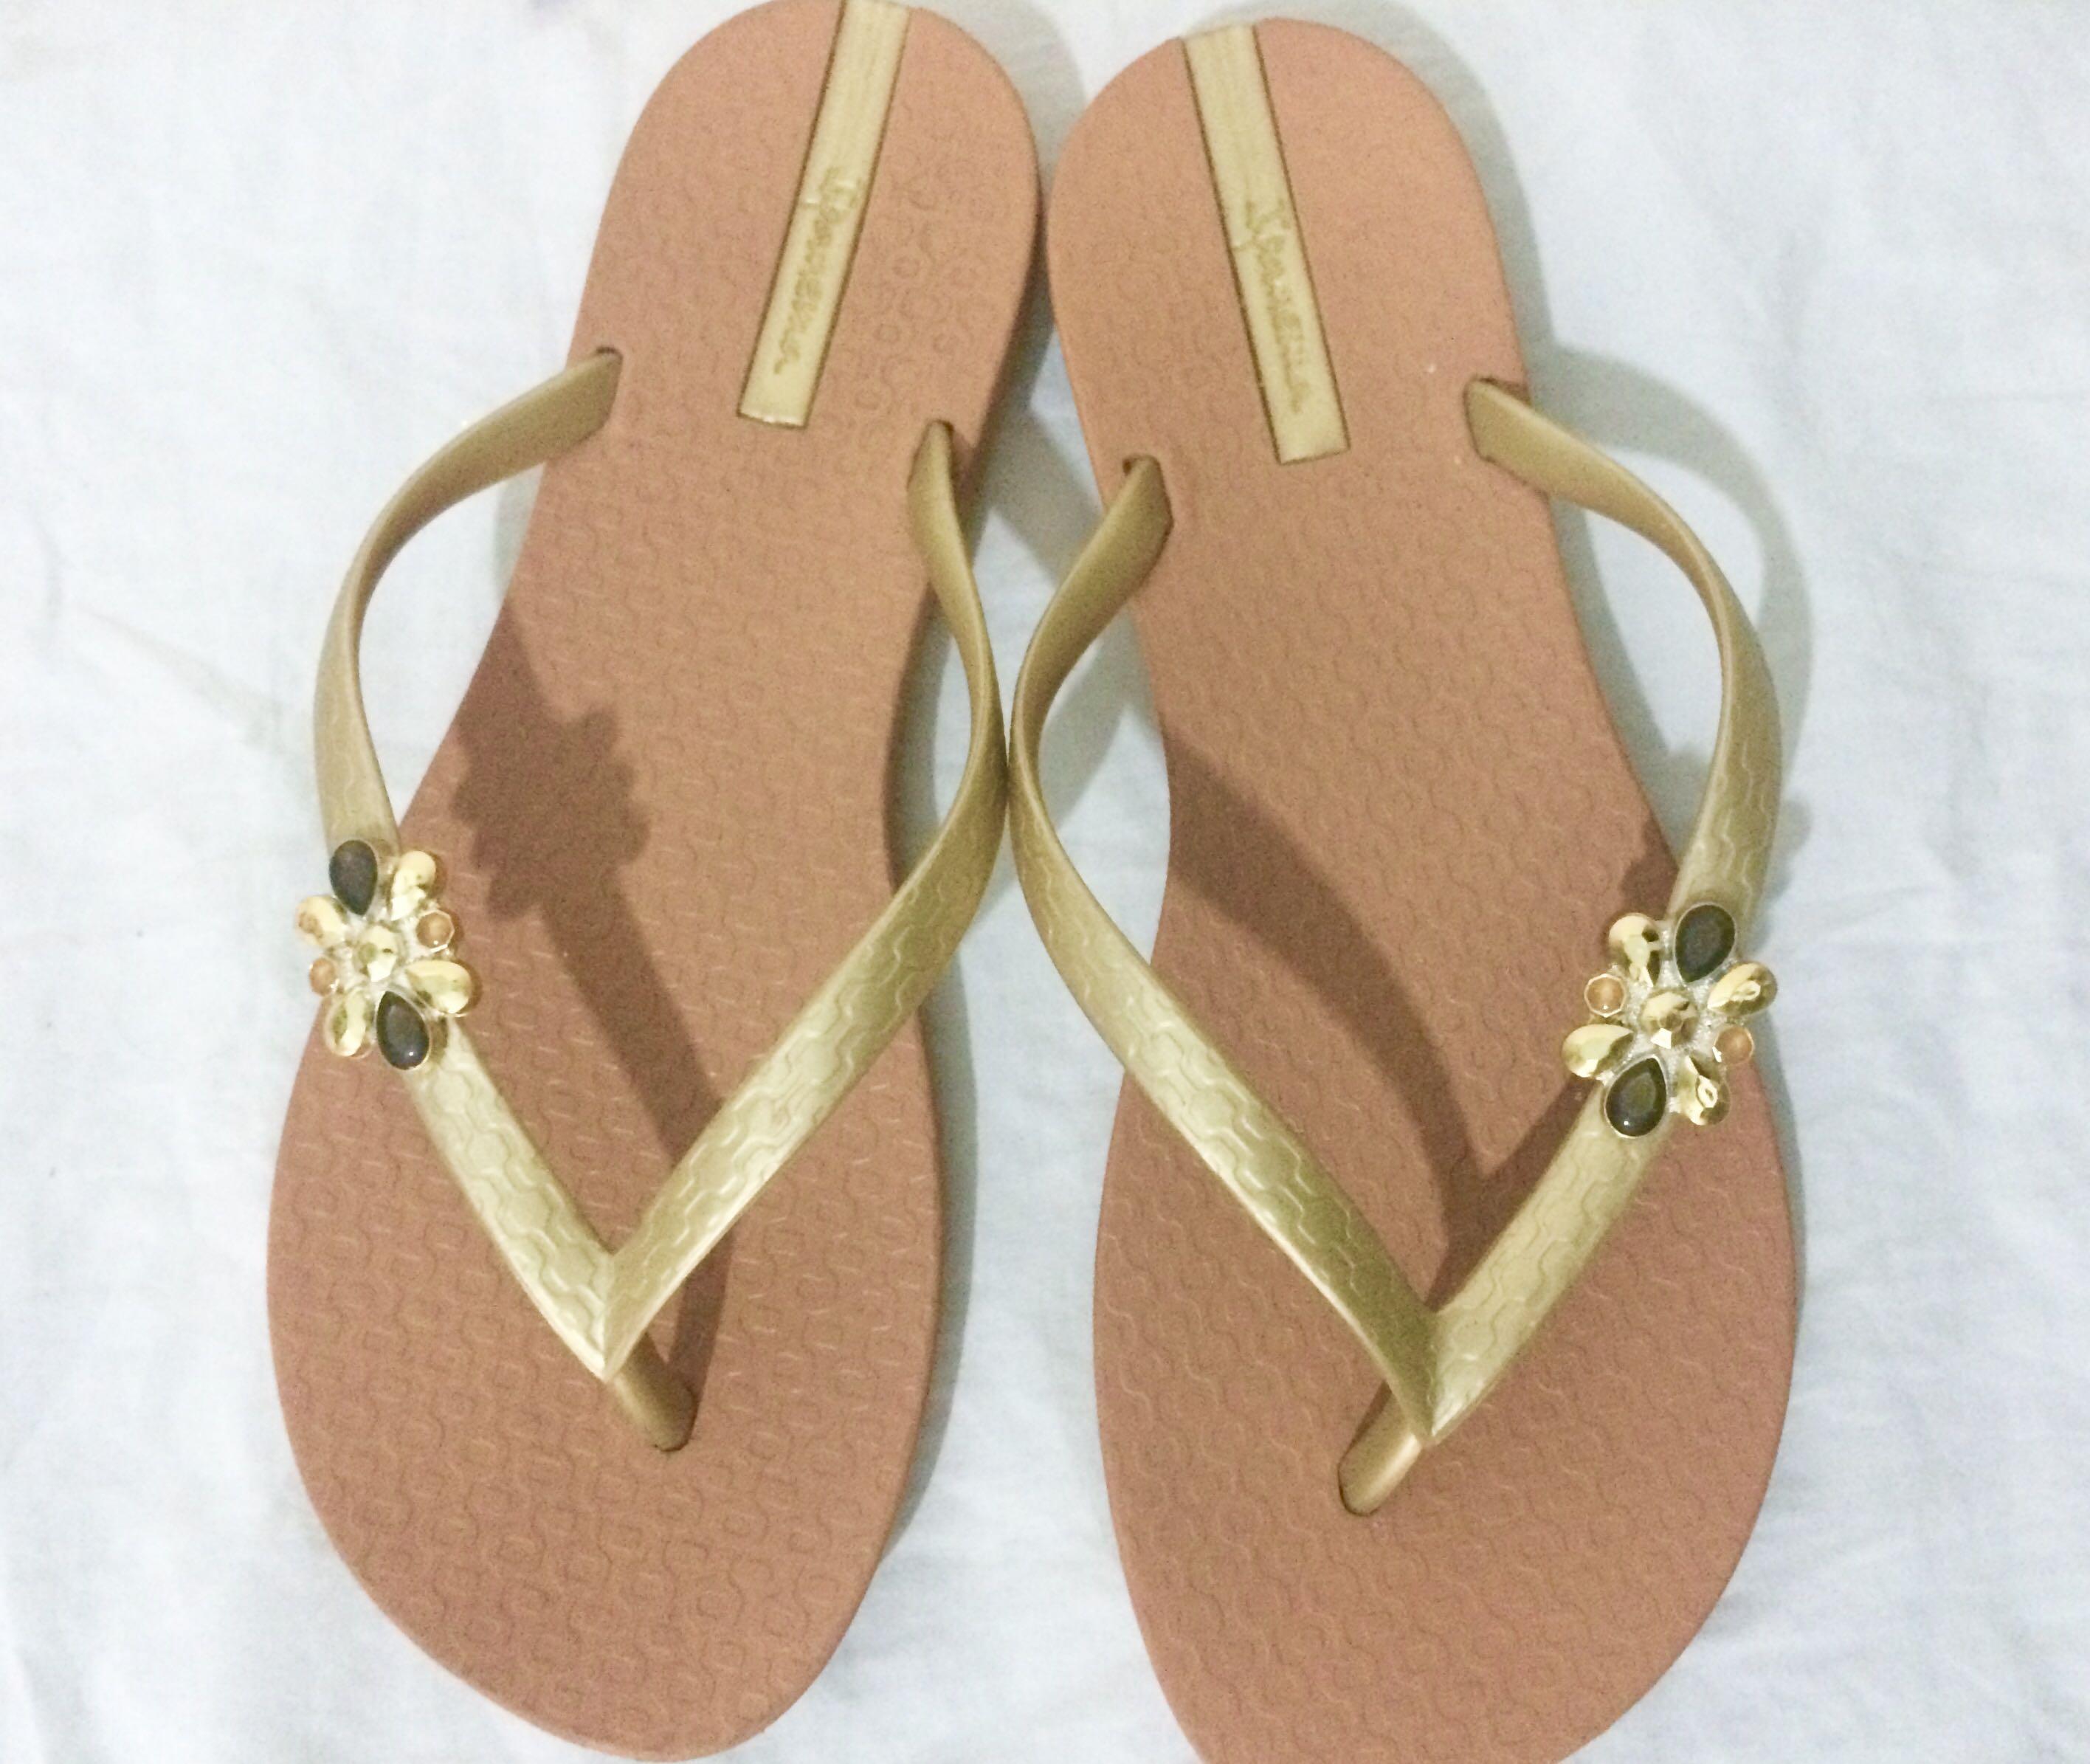 aa5c3ce6fcd79 Home · Women s Fashion · Shoes. photo photo ...